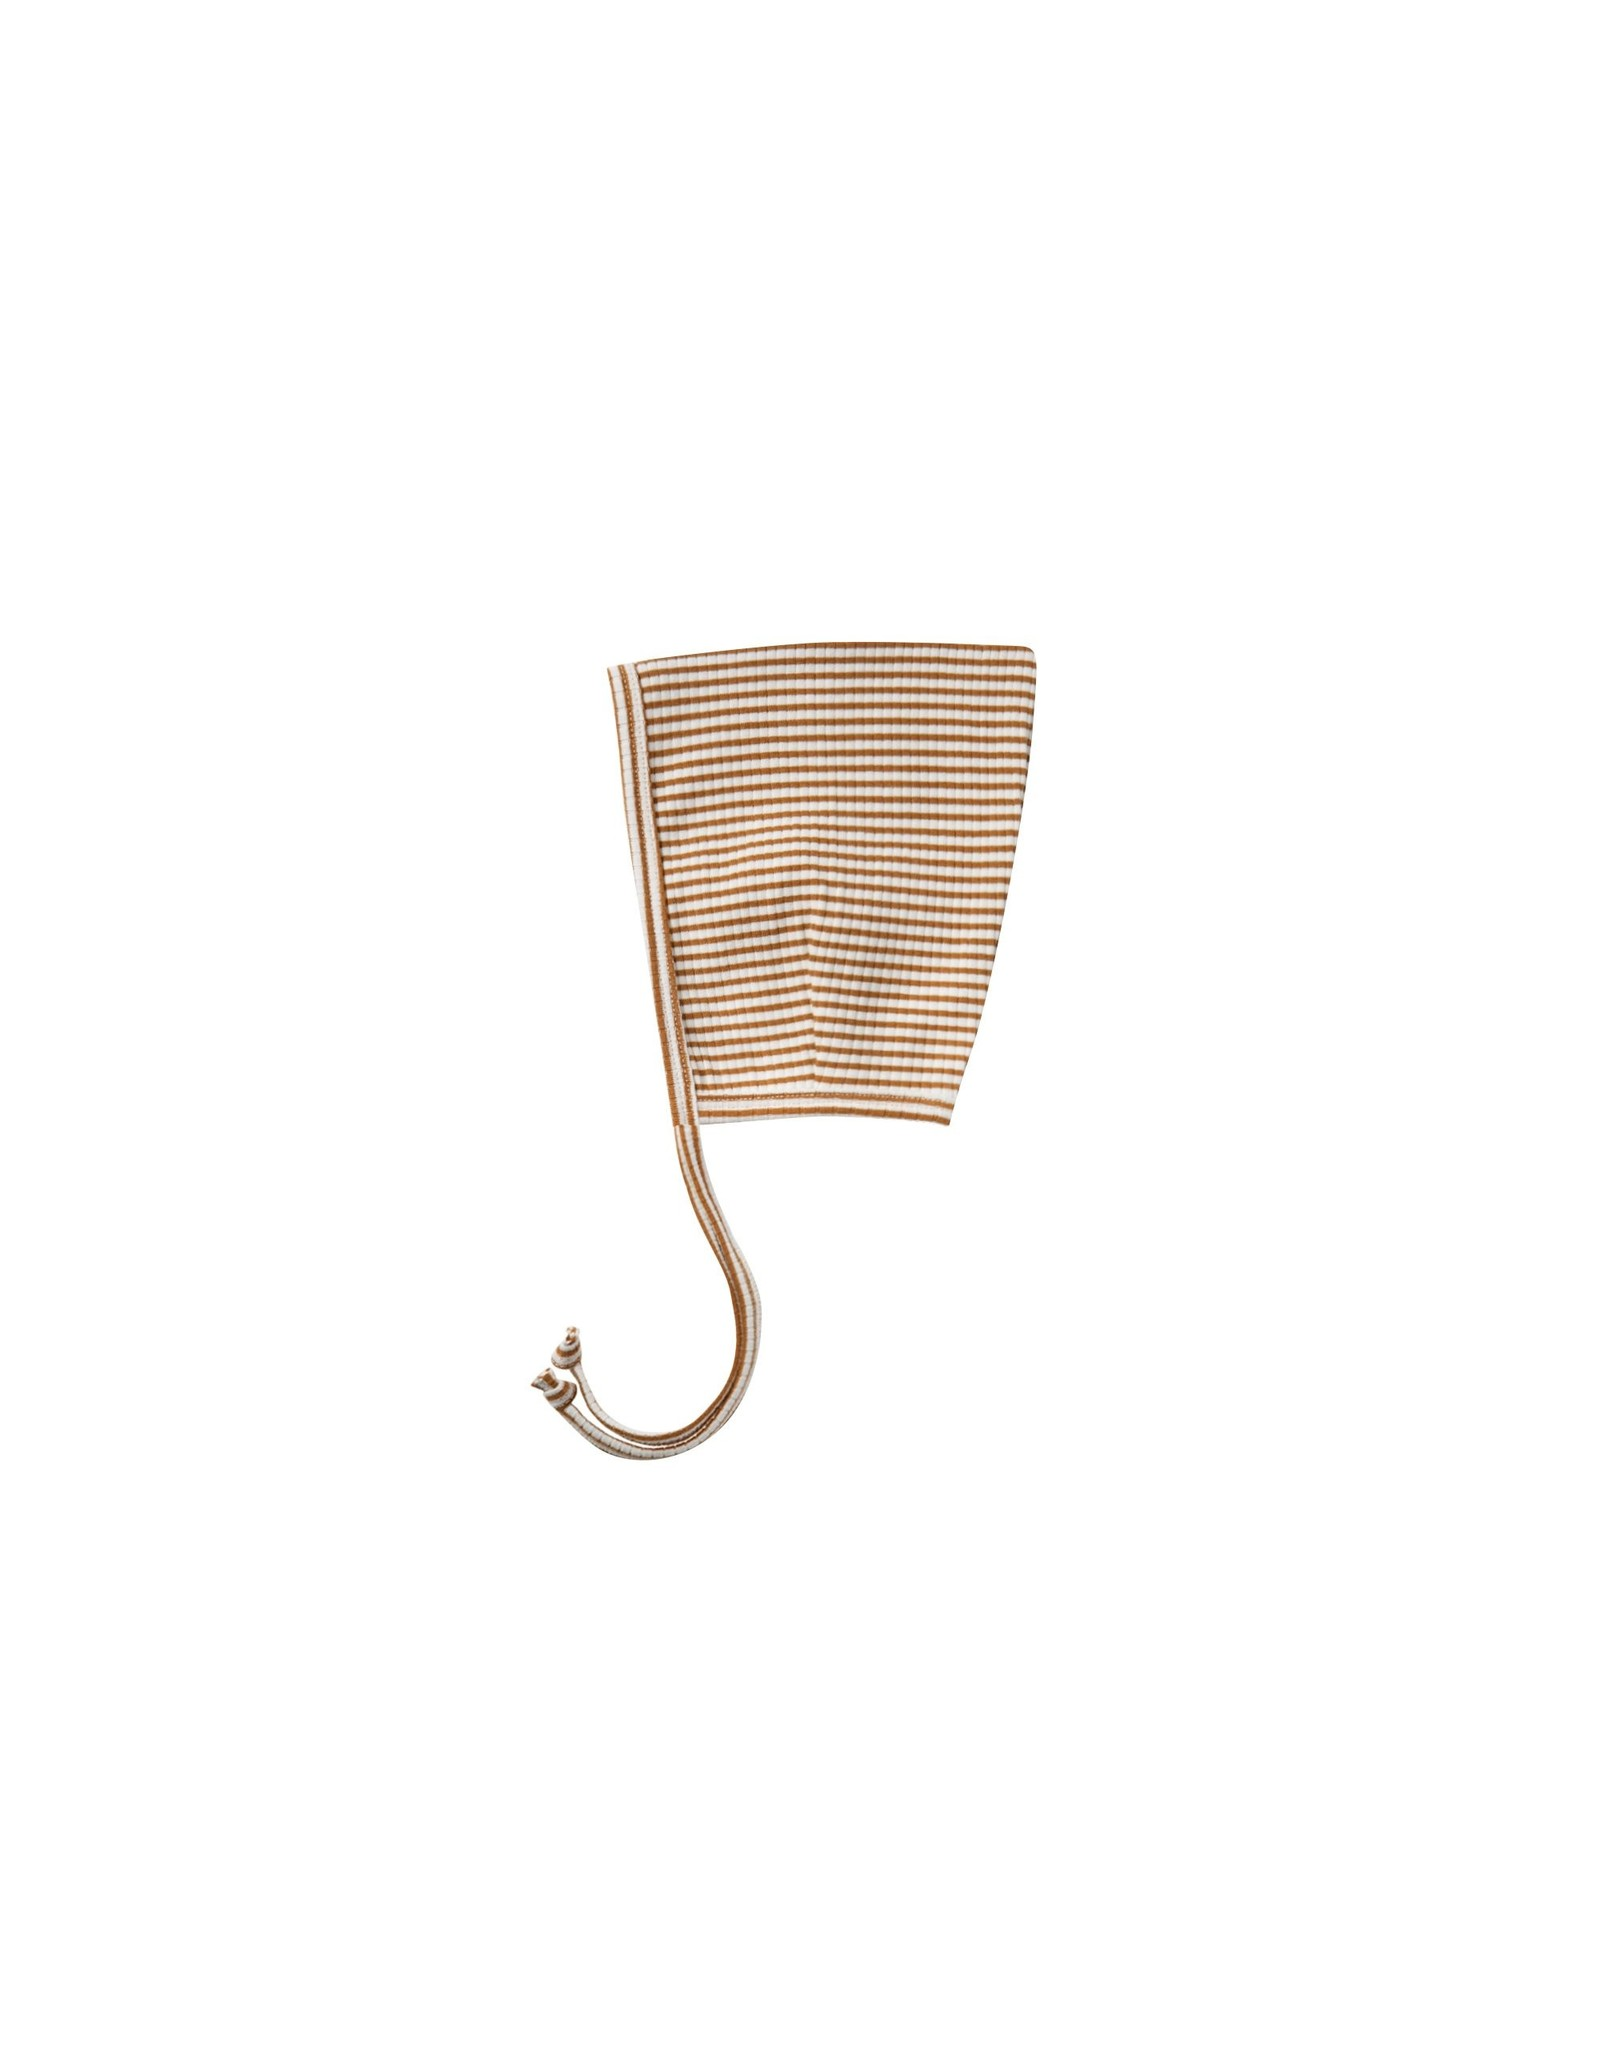 Quincy Mae Walnut Stripe Ribbed Bonnet